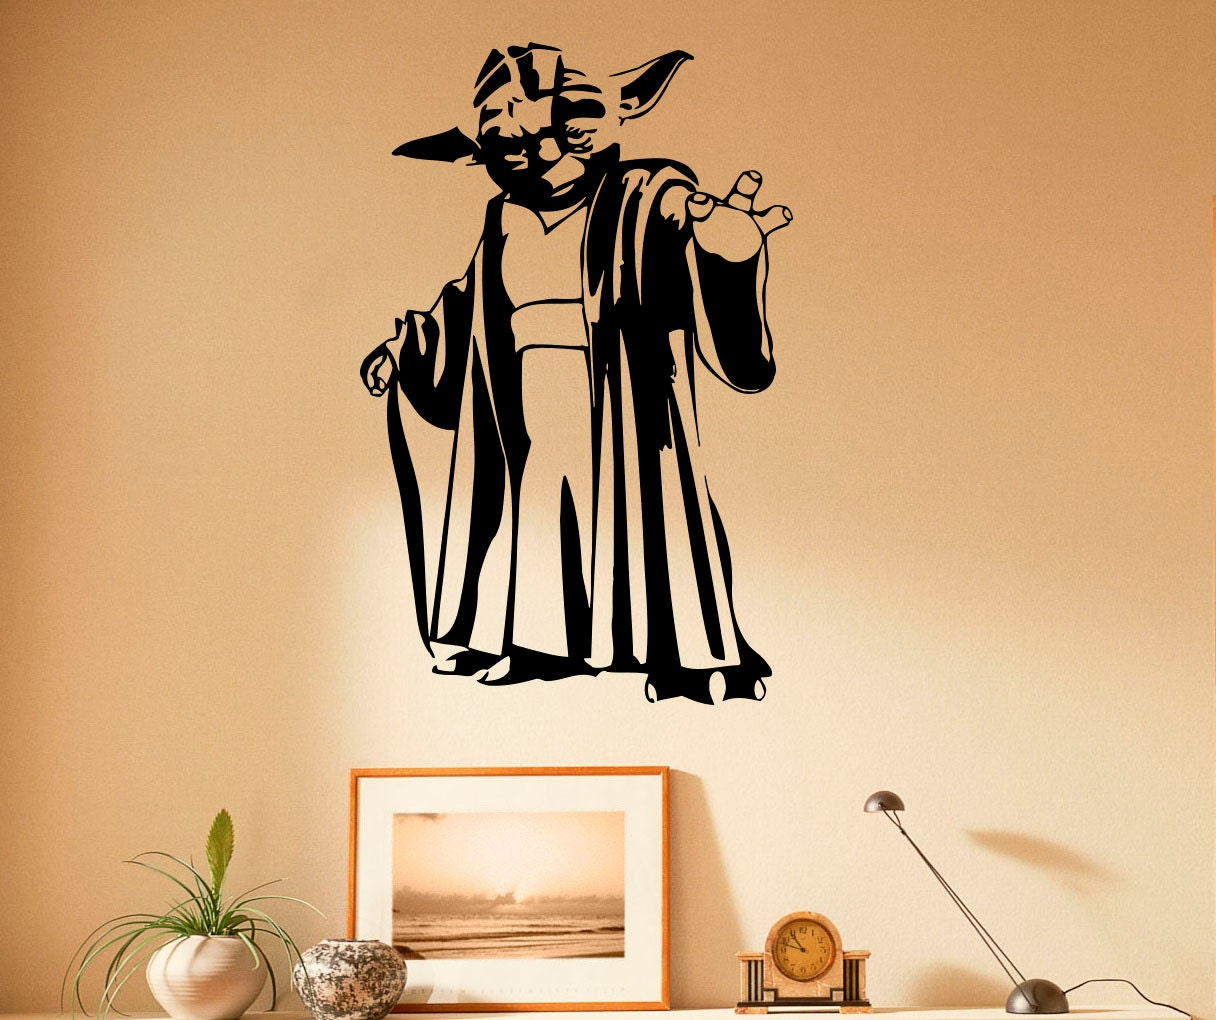 Master Yoda Wall Decal Vinyl Stickers Star Wars Home Interior | Etsy